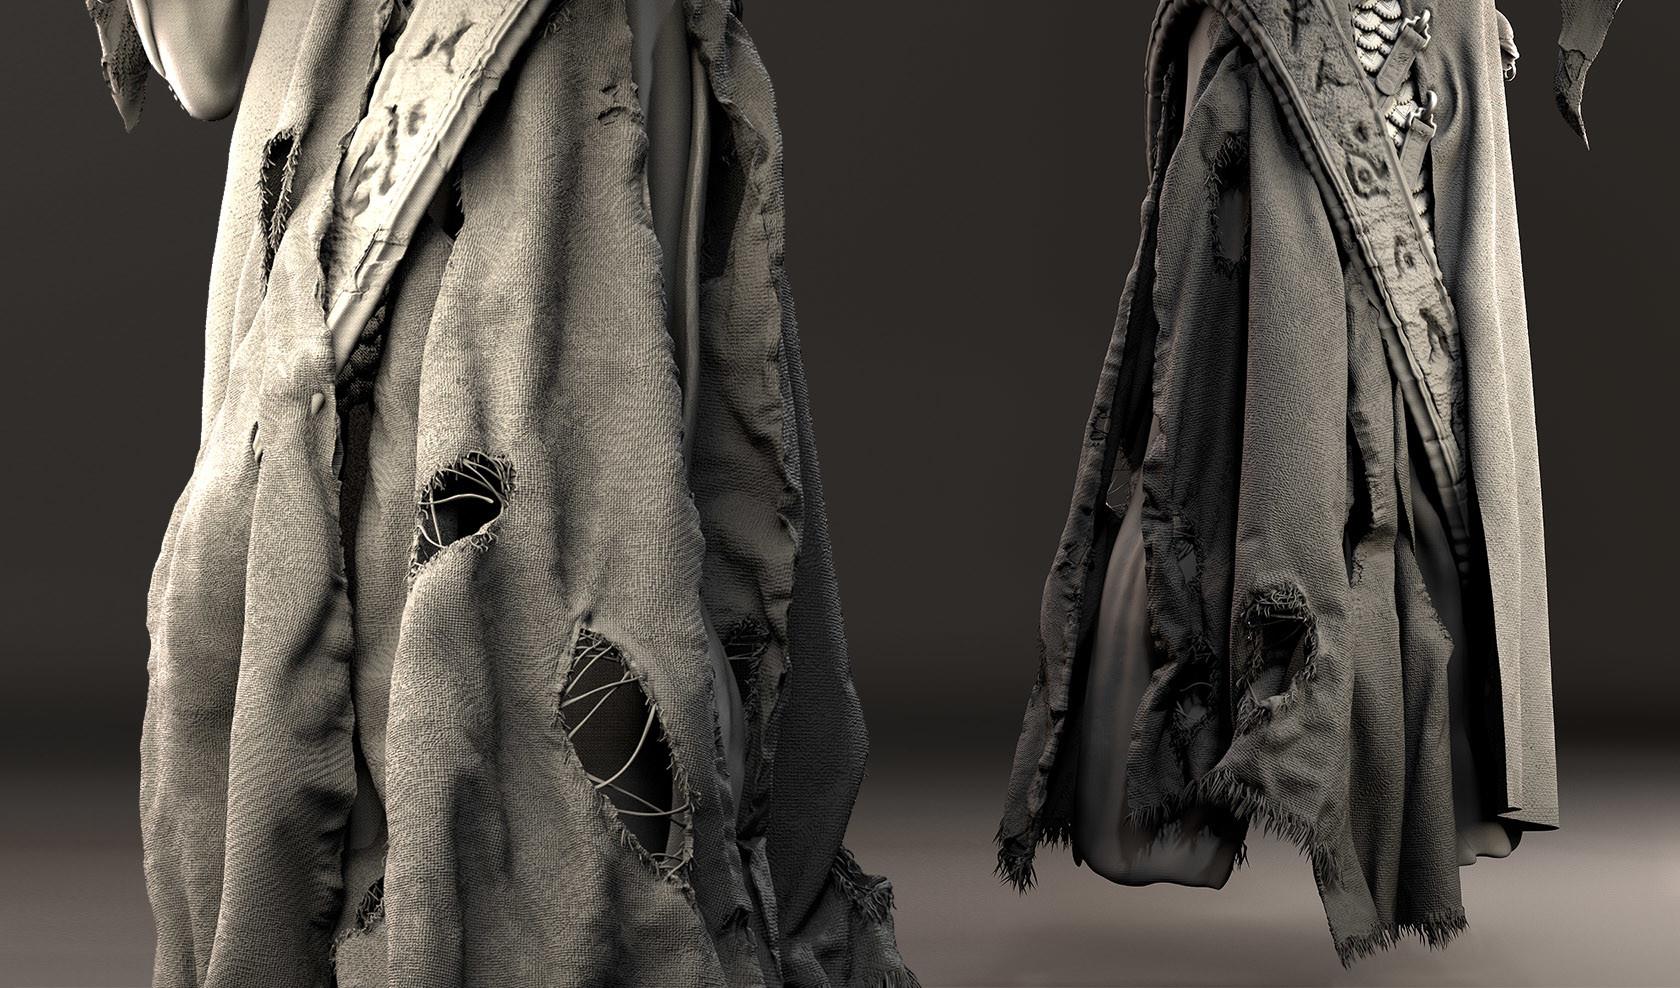 Jin hao villa wizard fabric